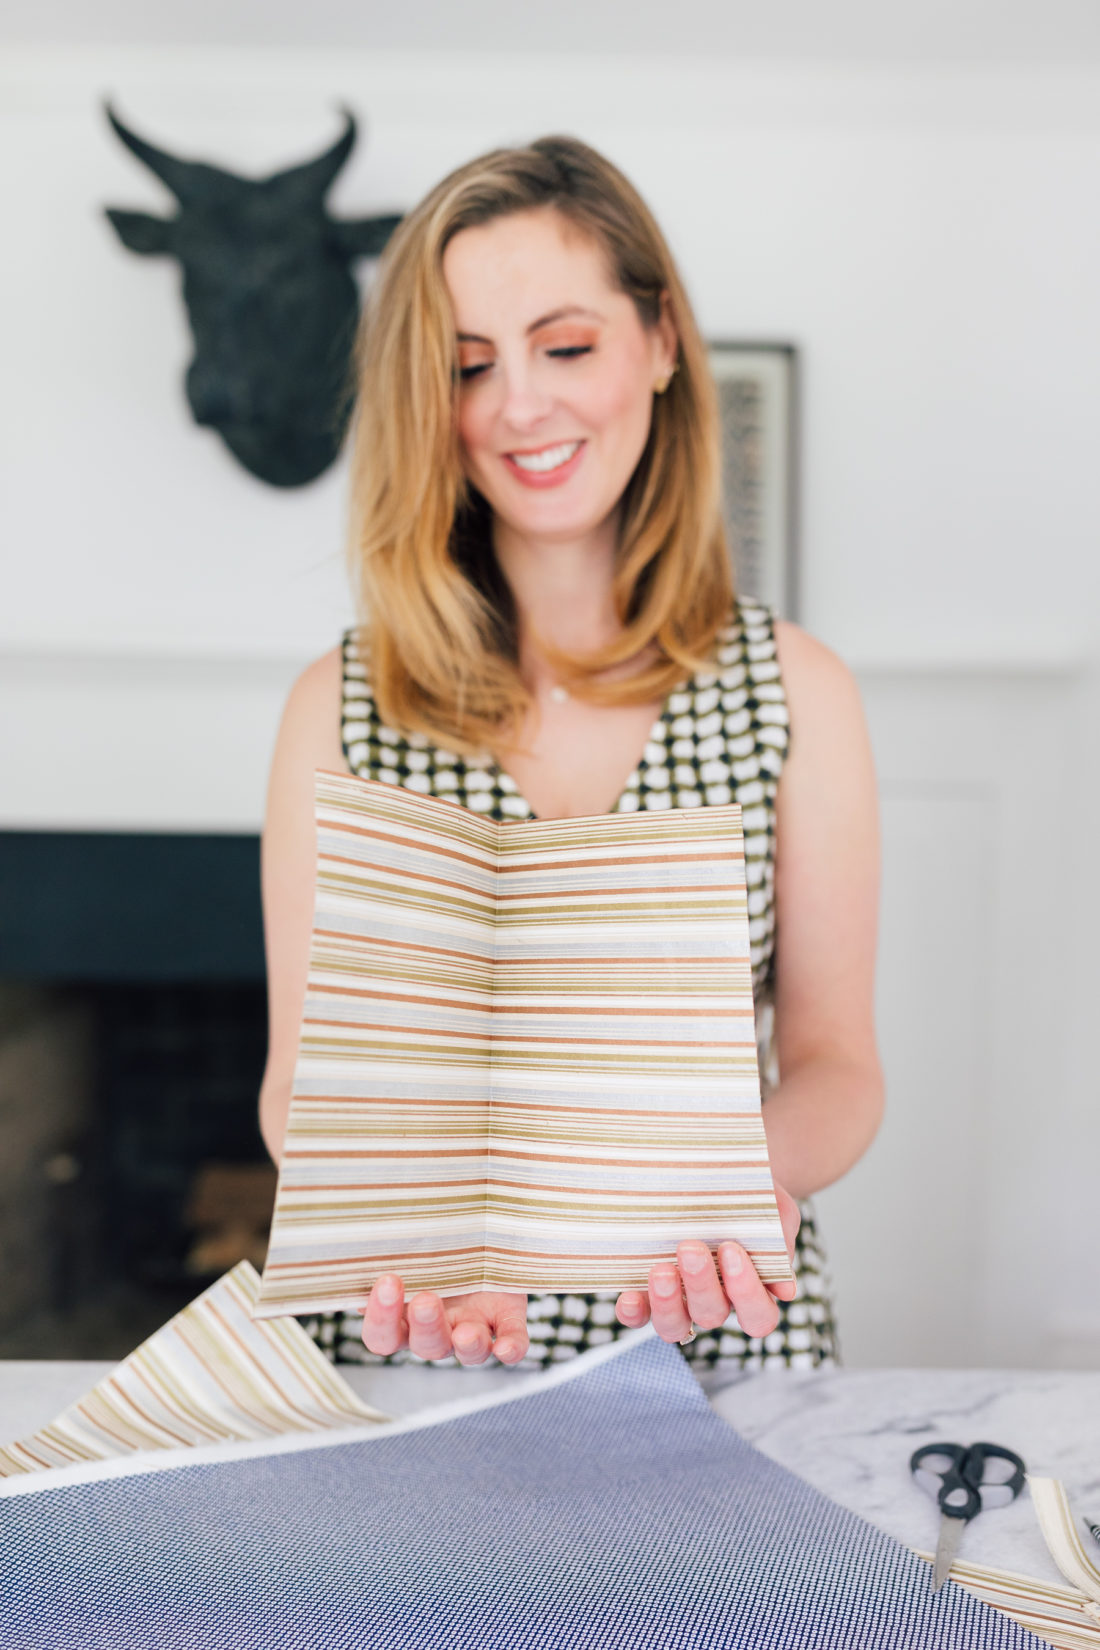 Eva Amurri Martino opens up one of her DIY shirt and tie cards